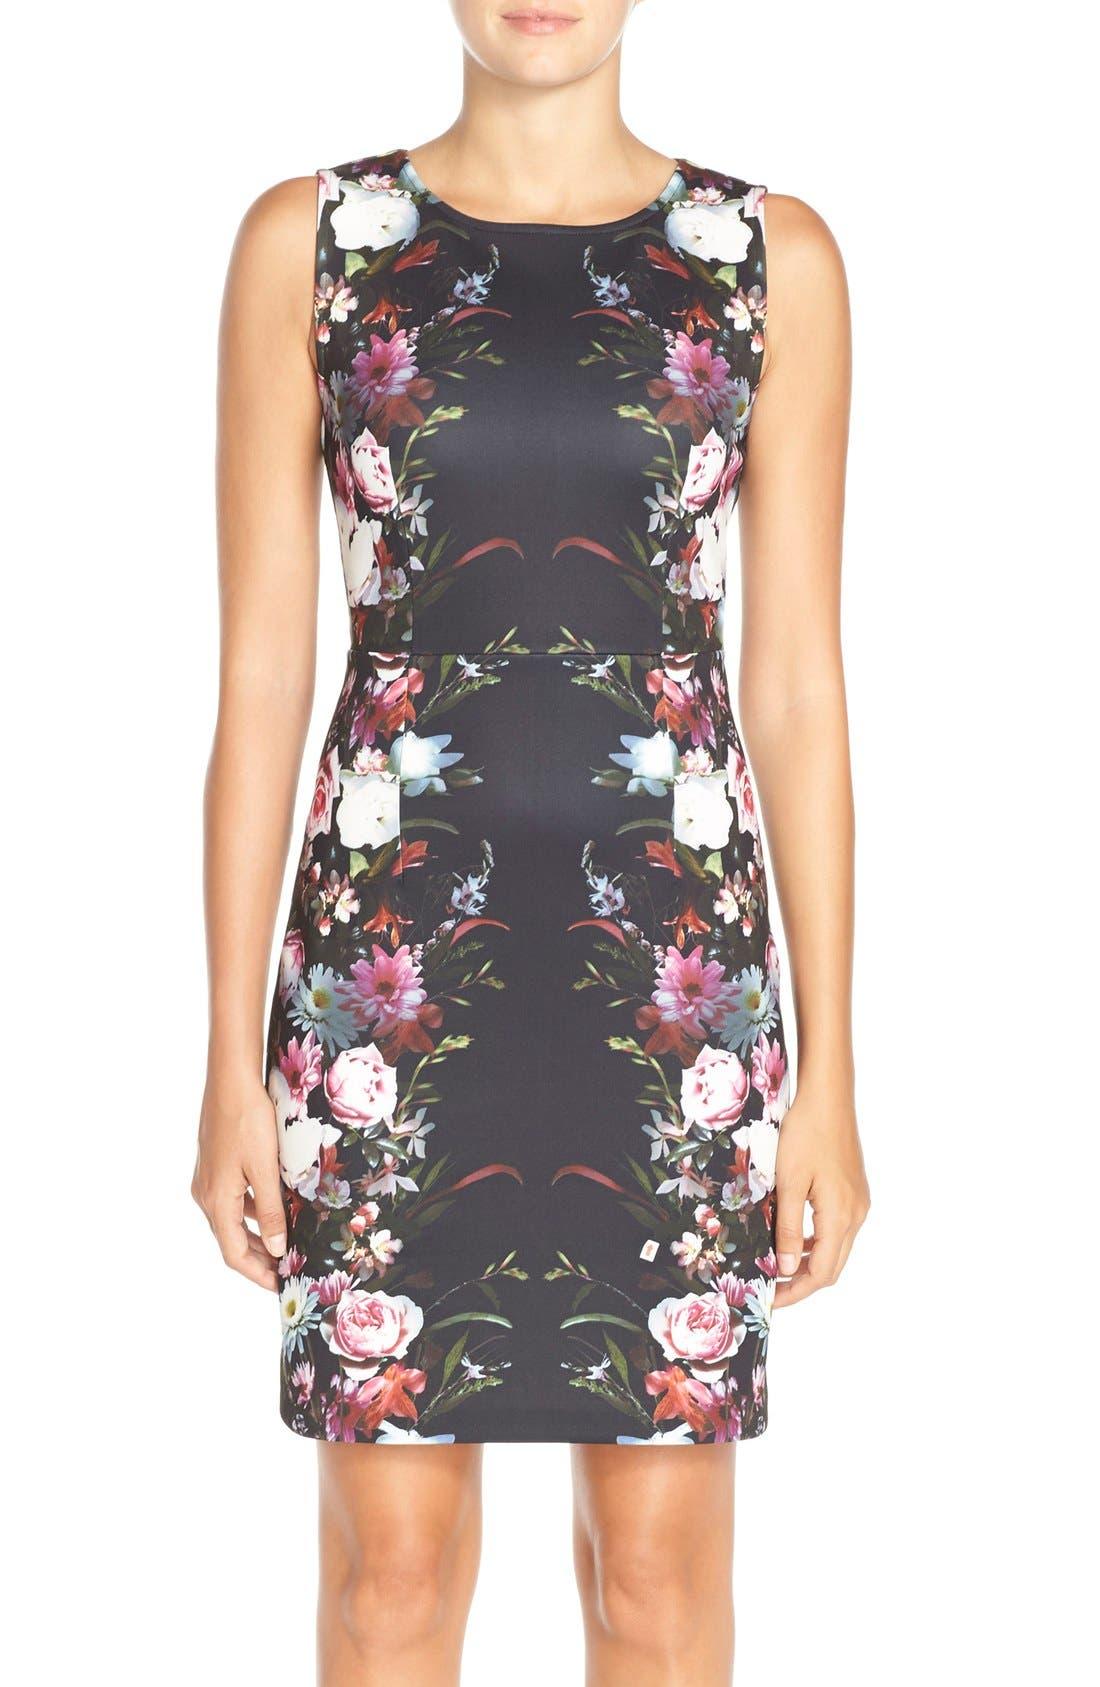 Alternate Image 1 Selected - Felicity & Coco Floral Print Scuba Sheath Dress (Regular & Petite) (Nordstrom Exclusive)